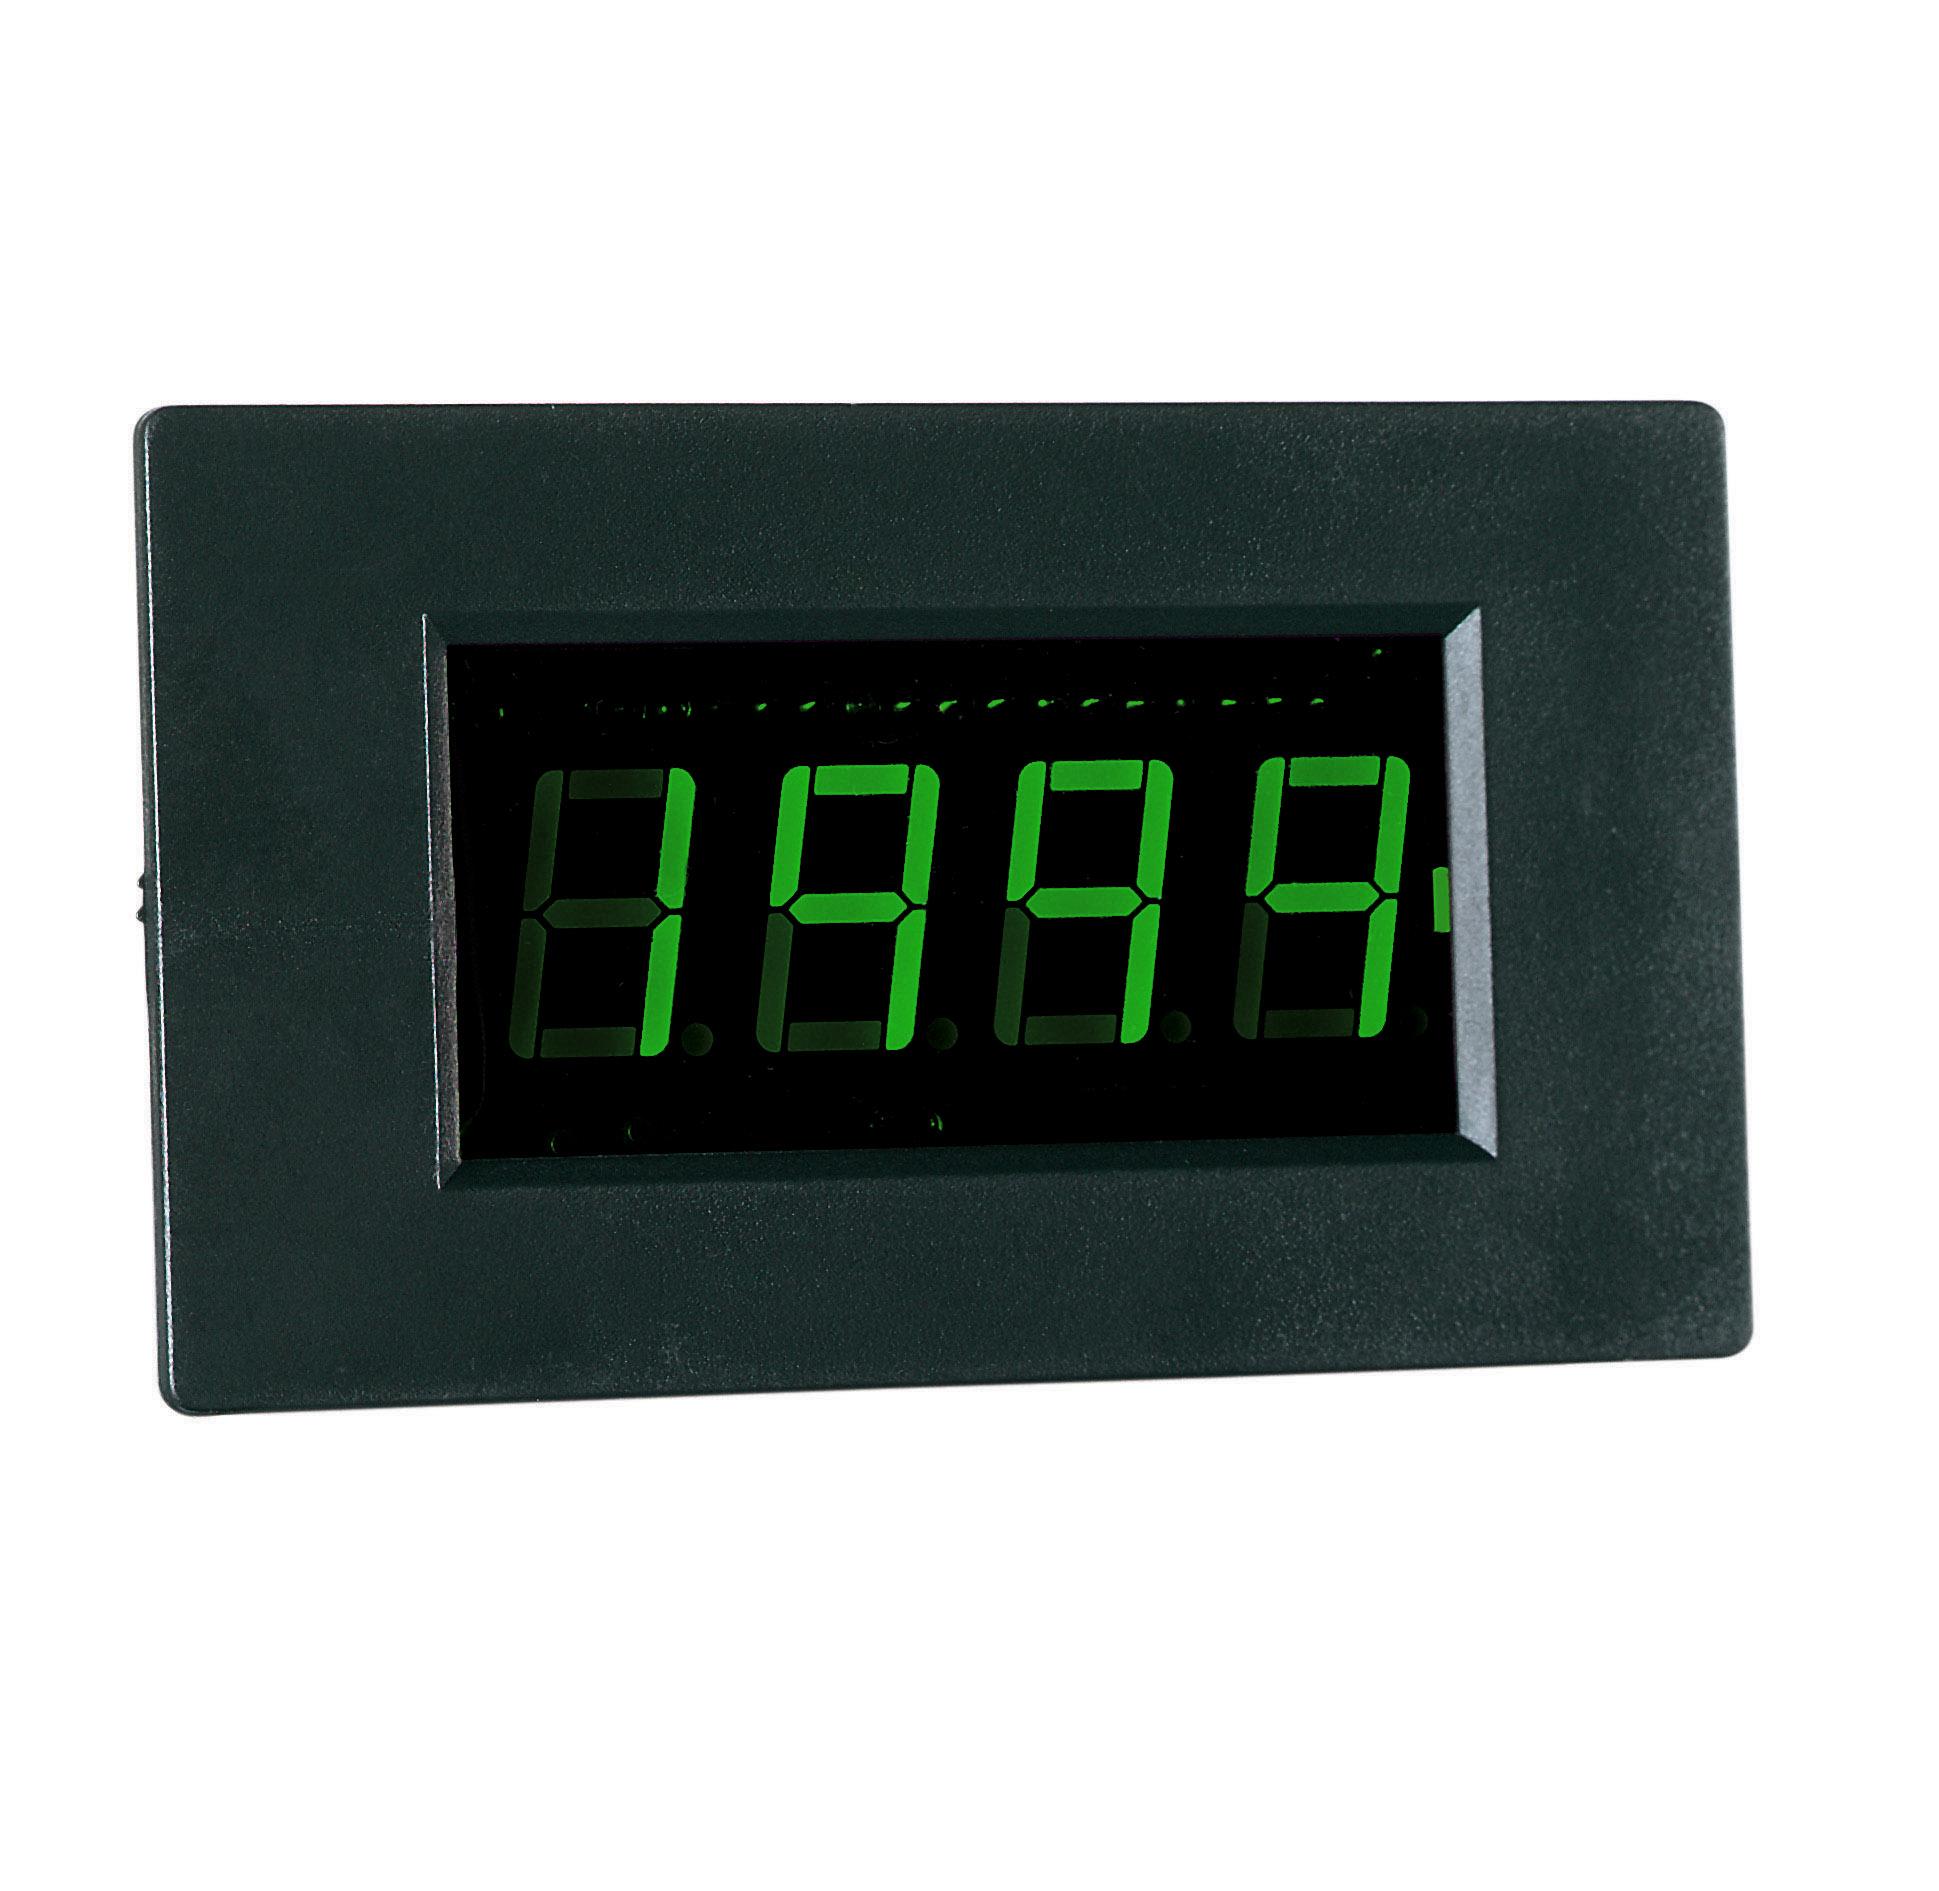 «PeakTech® LDP-240» Volt & ammeter, LCD display 14mm hight of digits